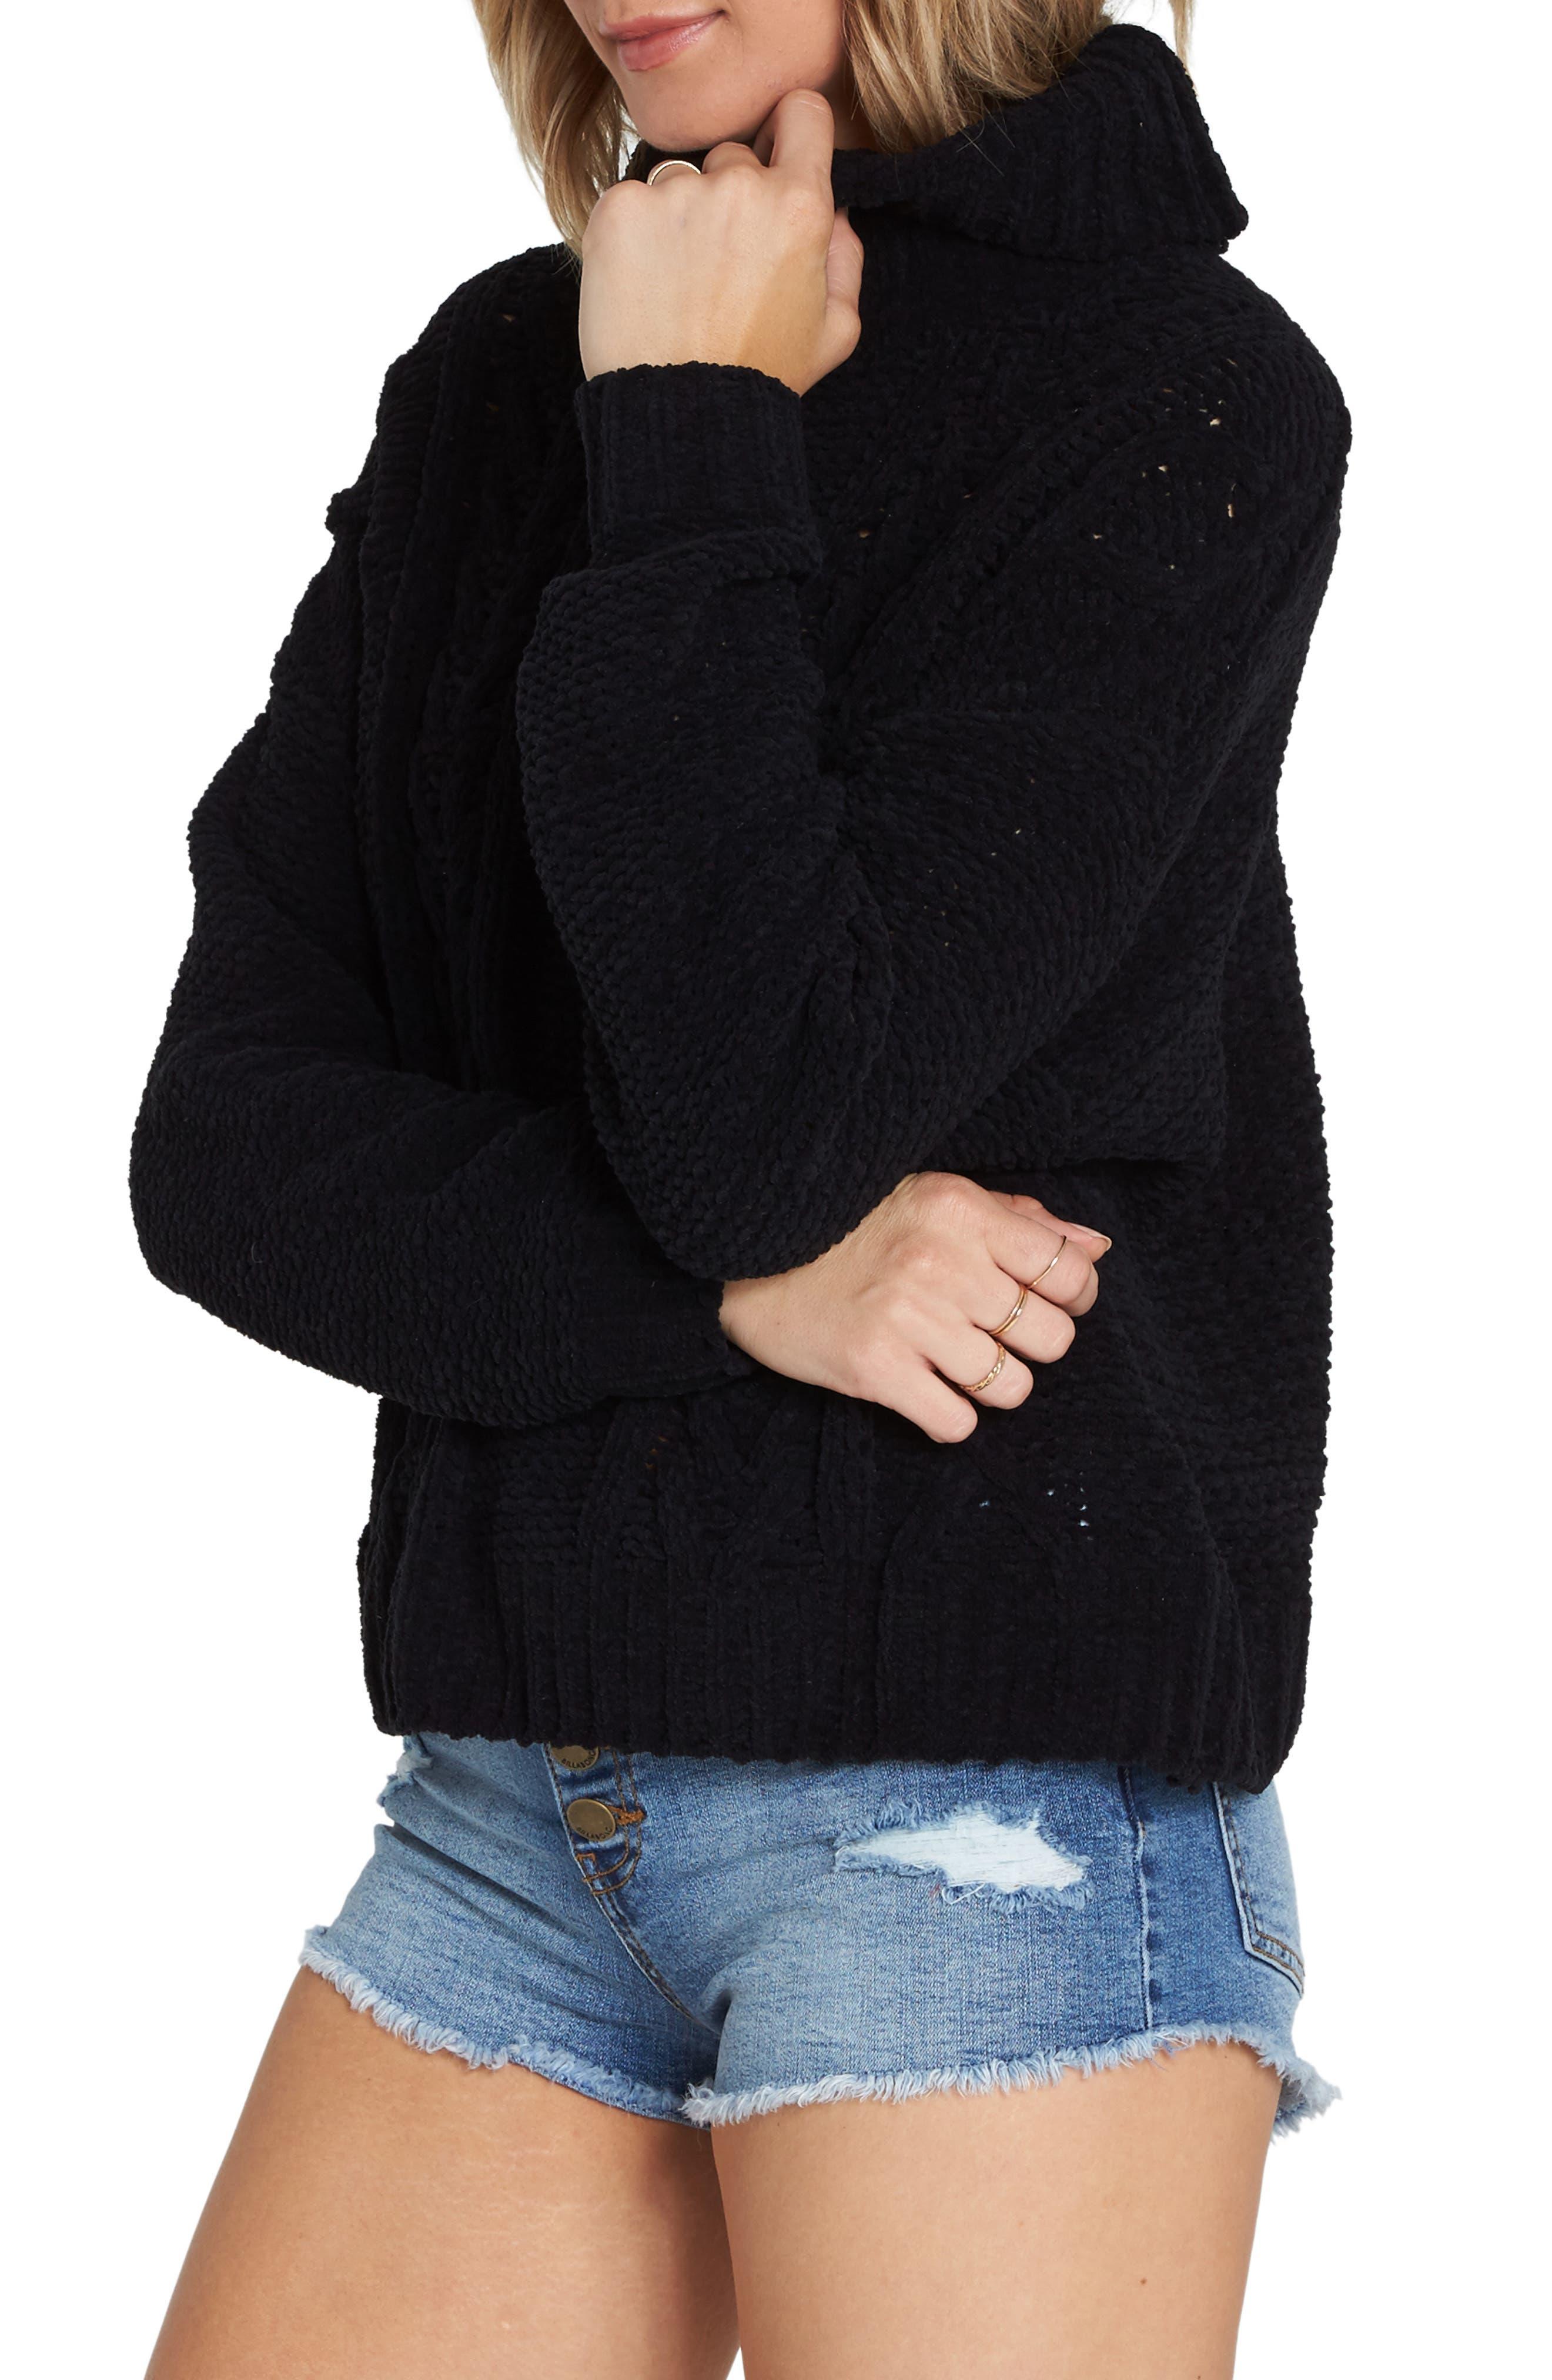 BILLABONG, Cable Knit Turtleneck Sweater, Alternate thumbnail 3, color, 001